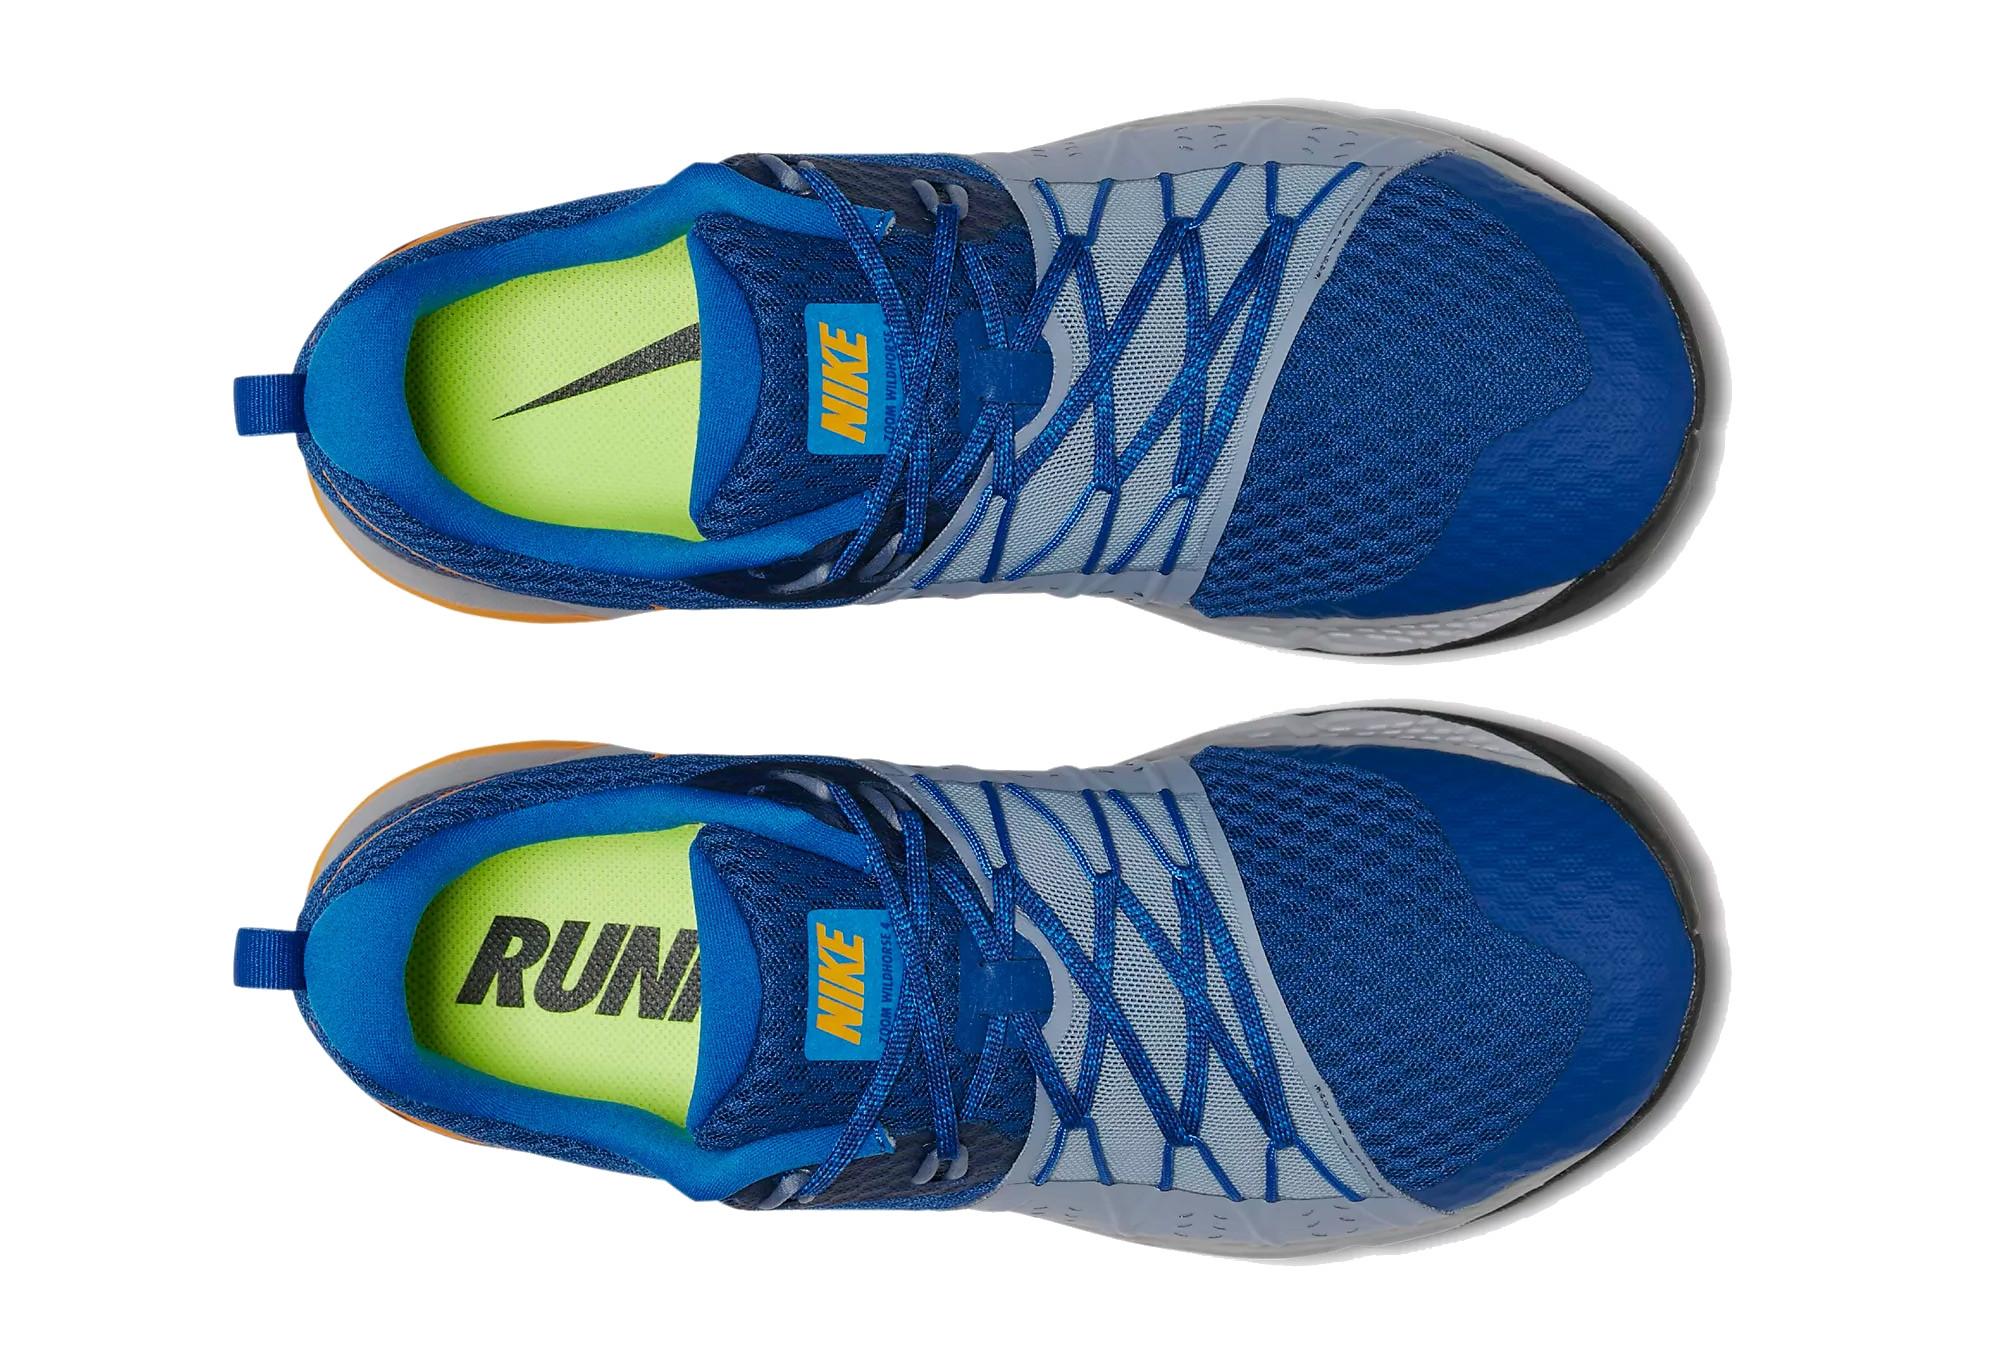 98ed61406d9 Nike Shoes Air Zoom Wildhorse 4 Blue Orange Men